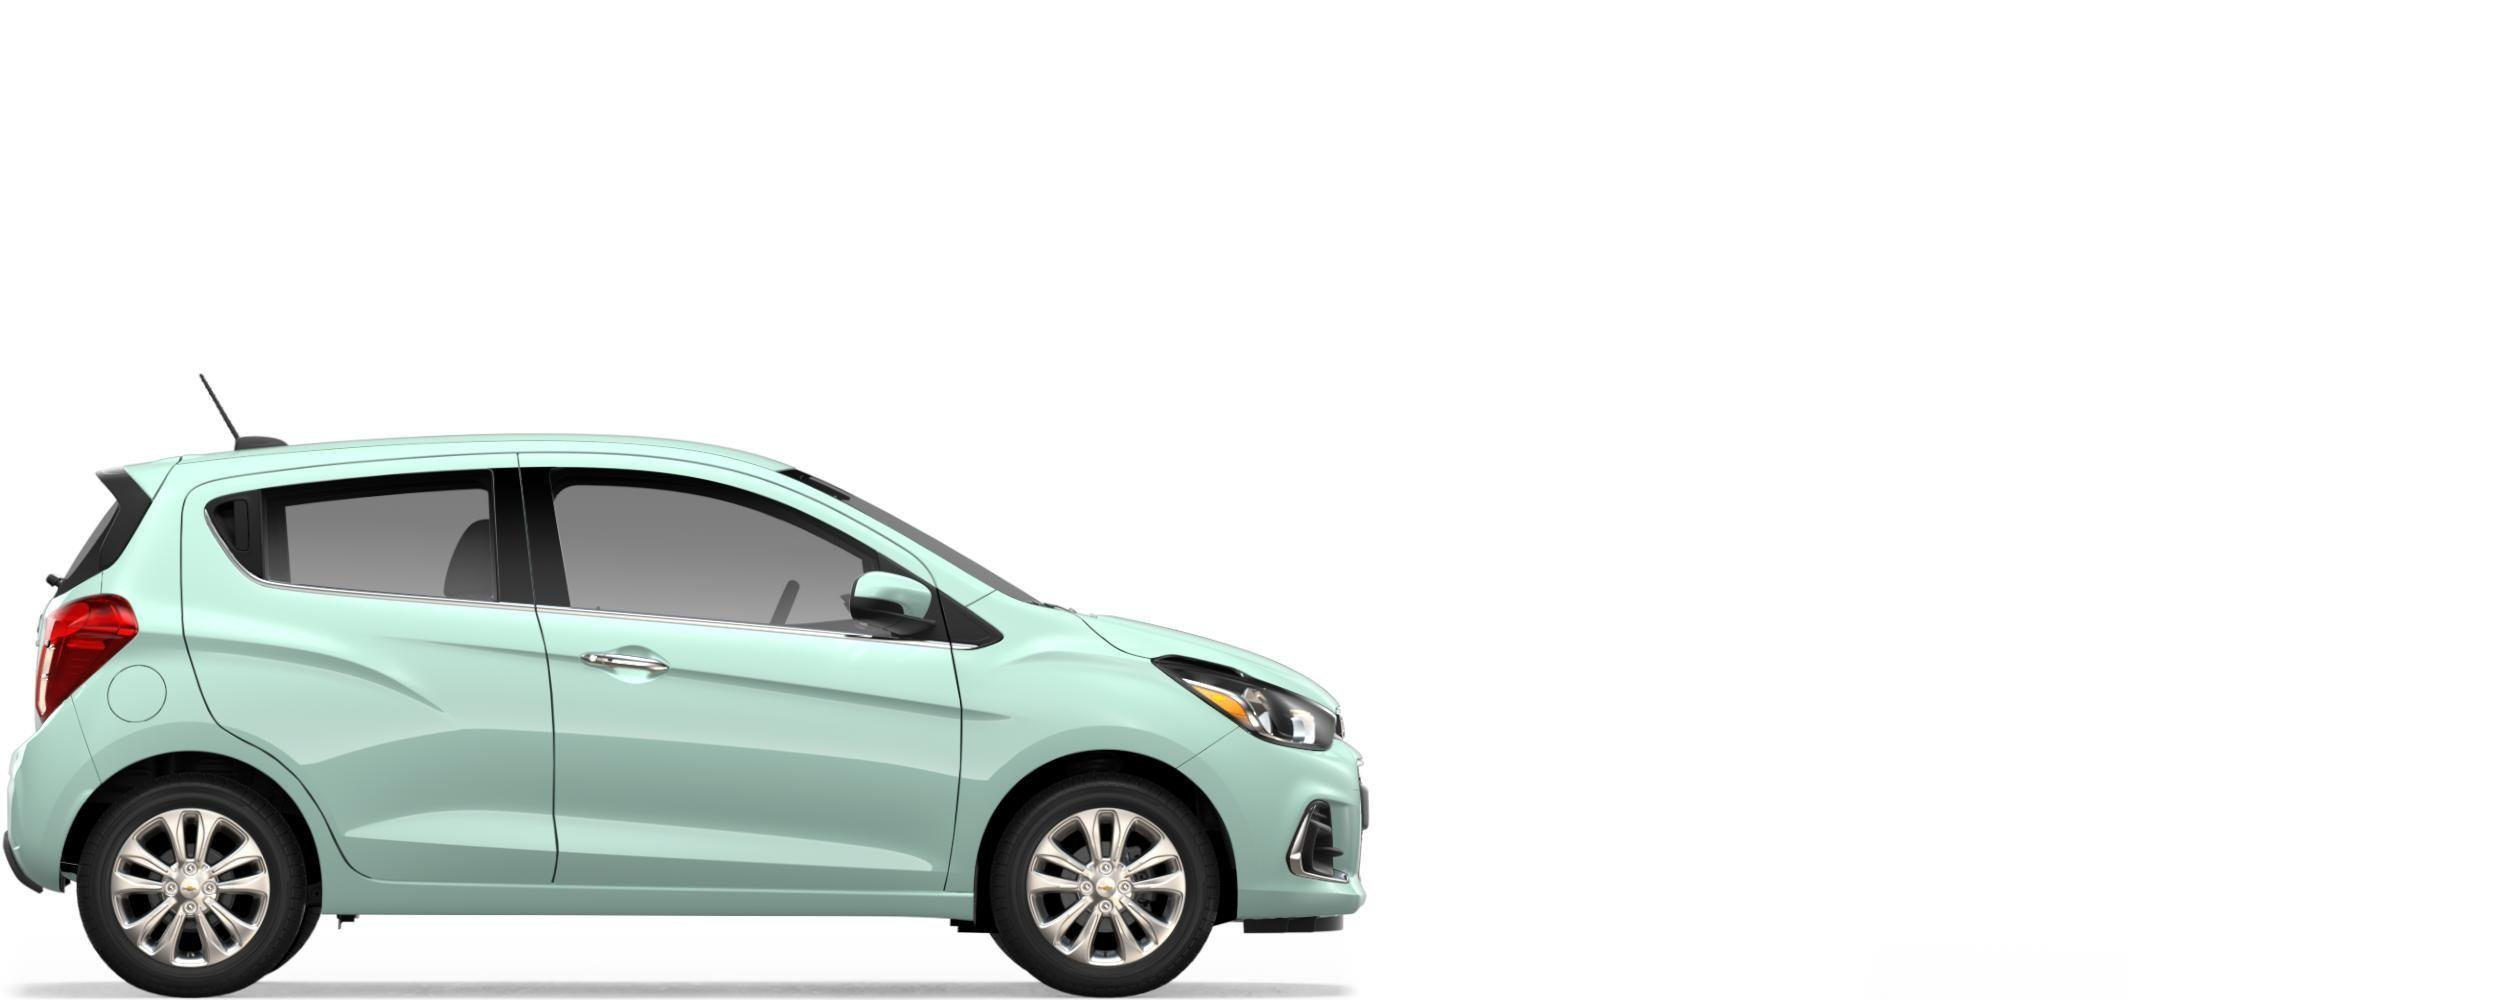 New 2019 Chevrolet Spark In Columbia | Granite City | Creve Coeur Illinois